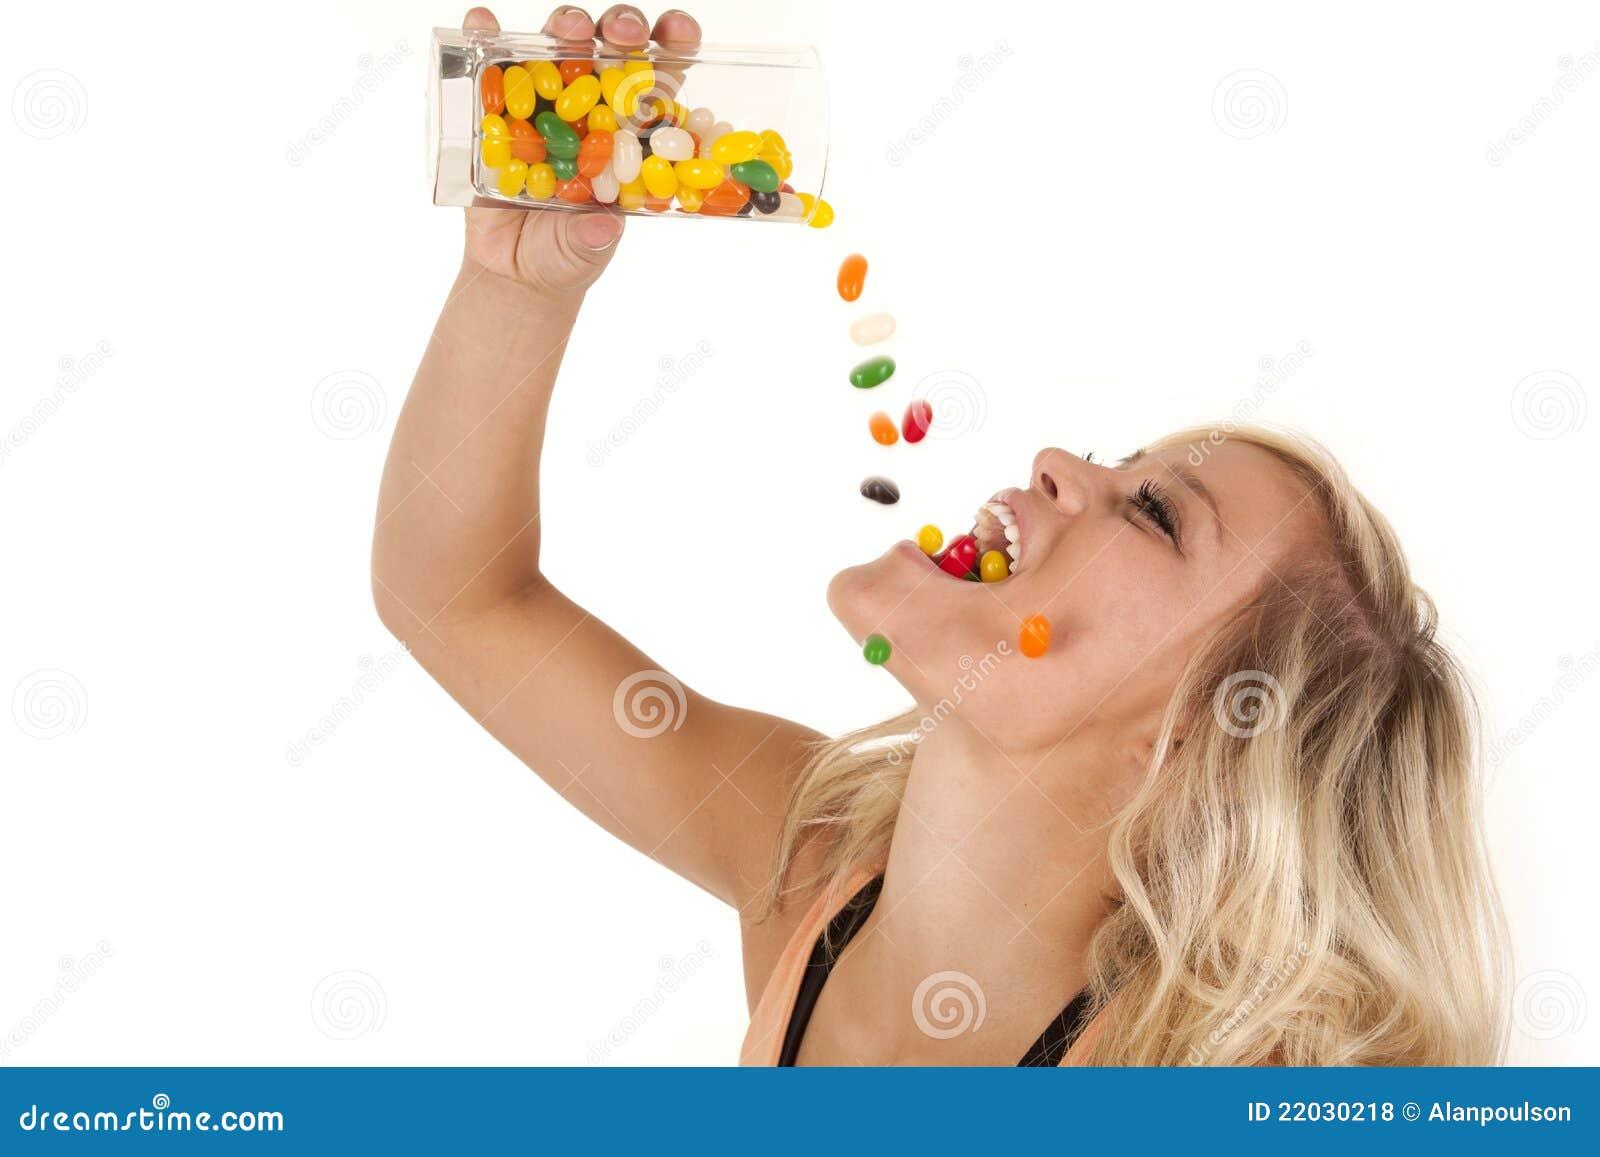 Bé Đẹp nói sai rồi!  Woman-pouring-jelly-beans-mouth-22030218